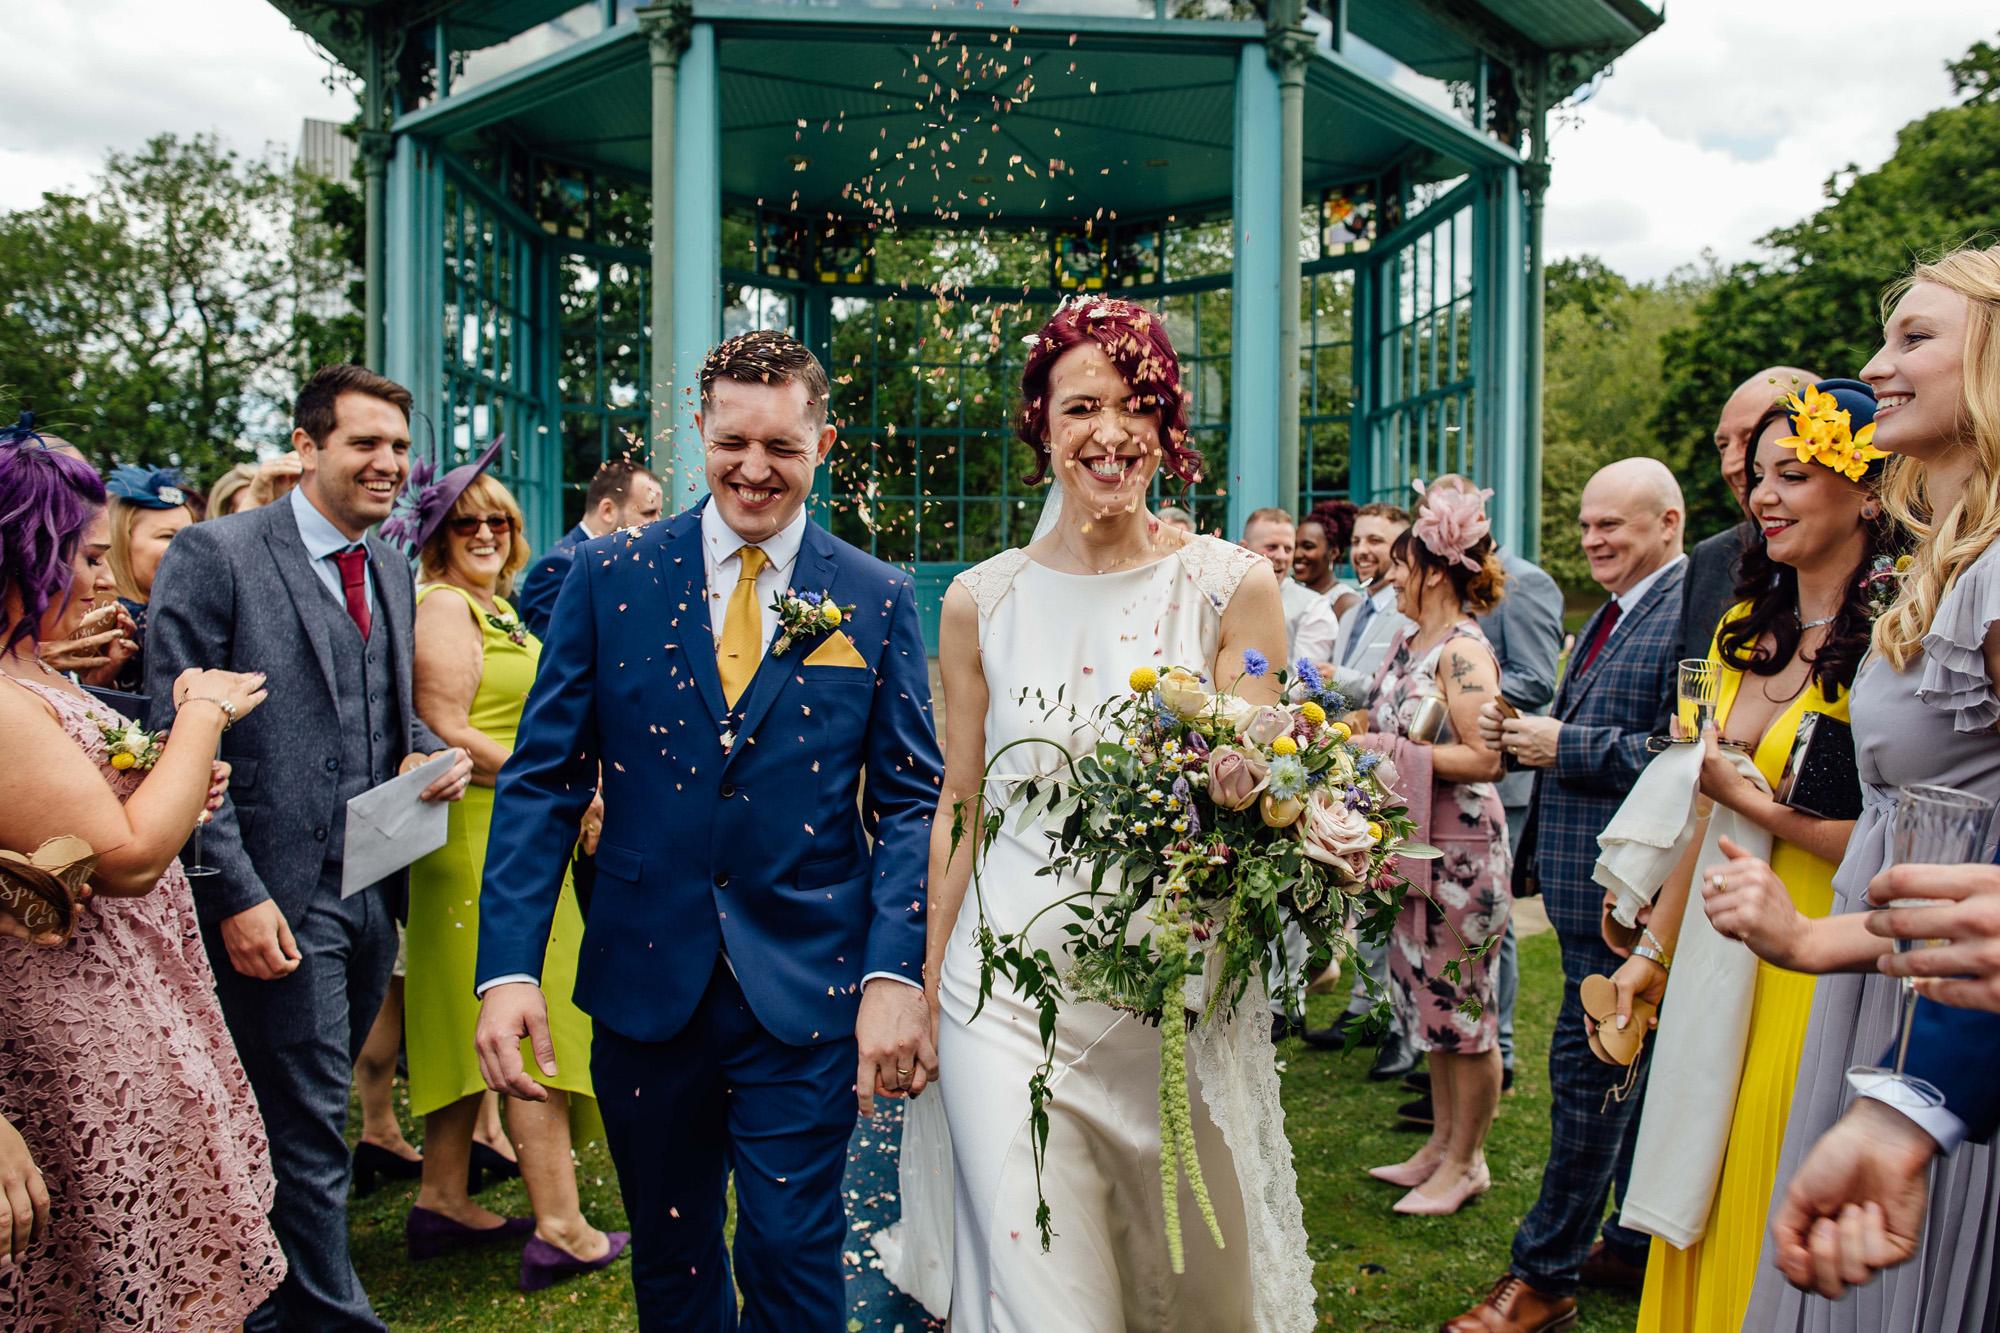 Sarah-Honeysuckle-Bias-Cut-Silk-Vintage-Inspired-Wedding-Gown-Sheffield-Wedding-Kate-Beaumont-27.jpg